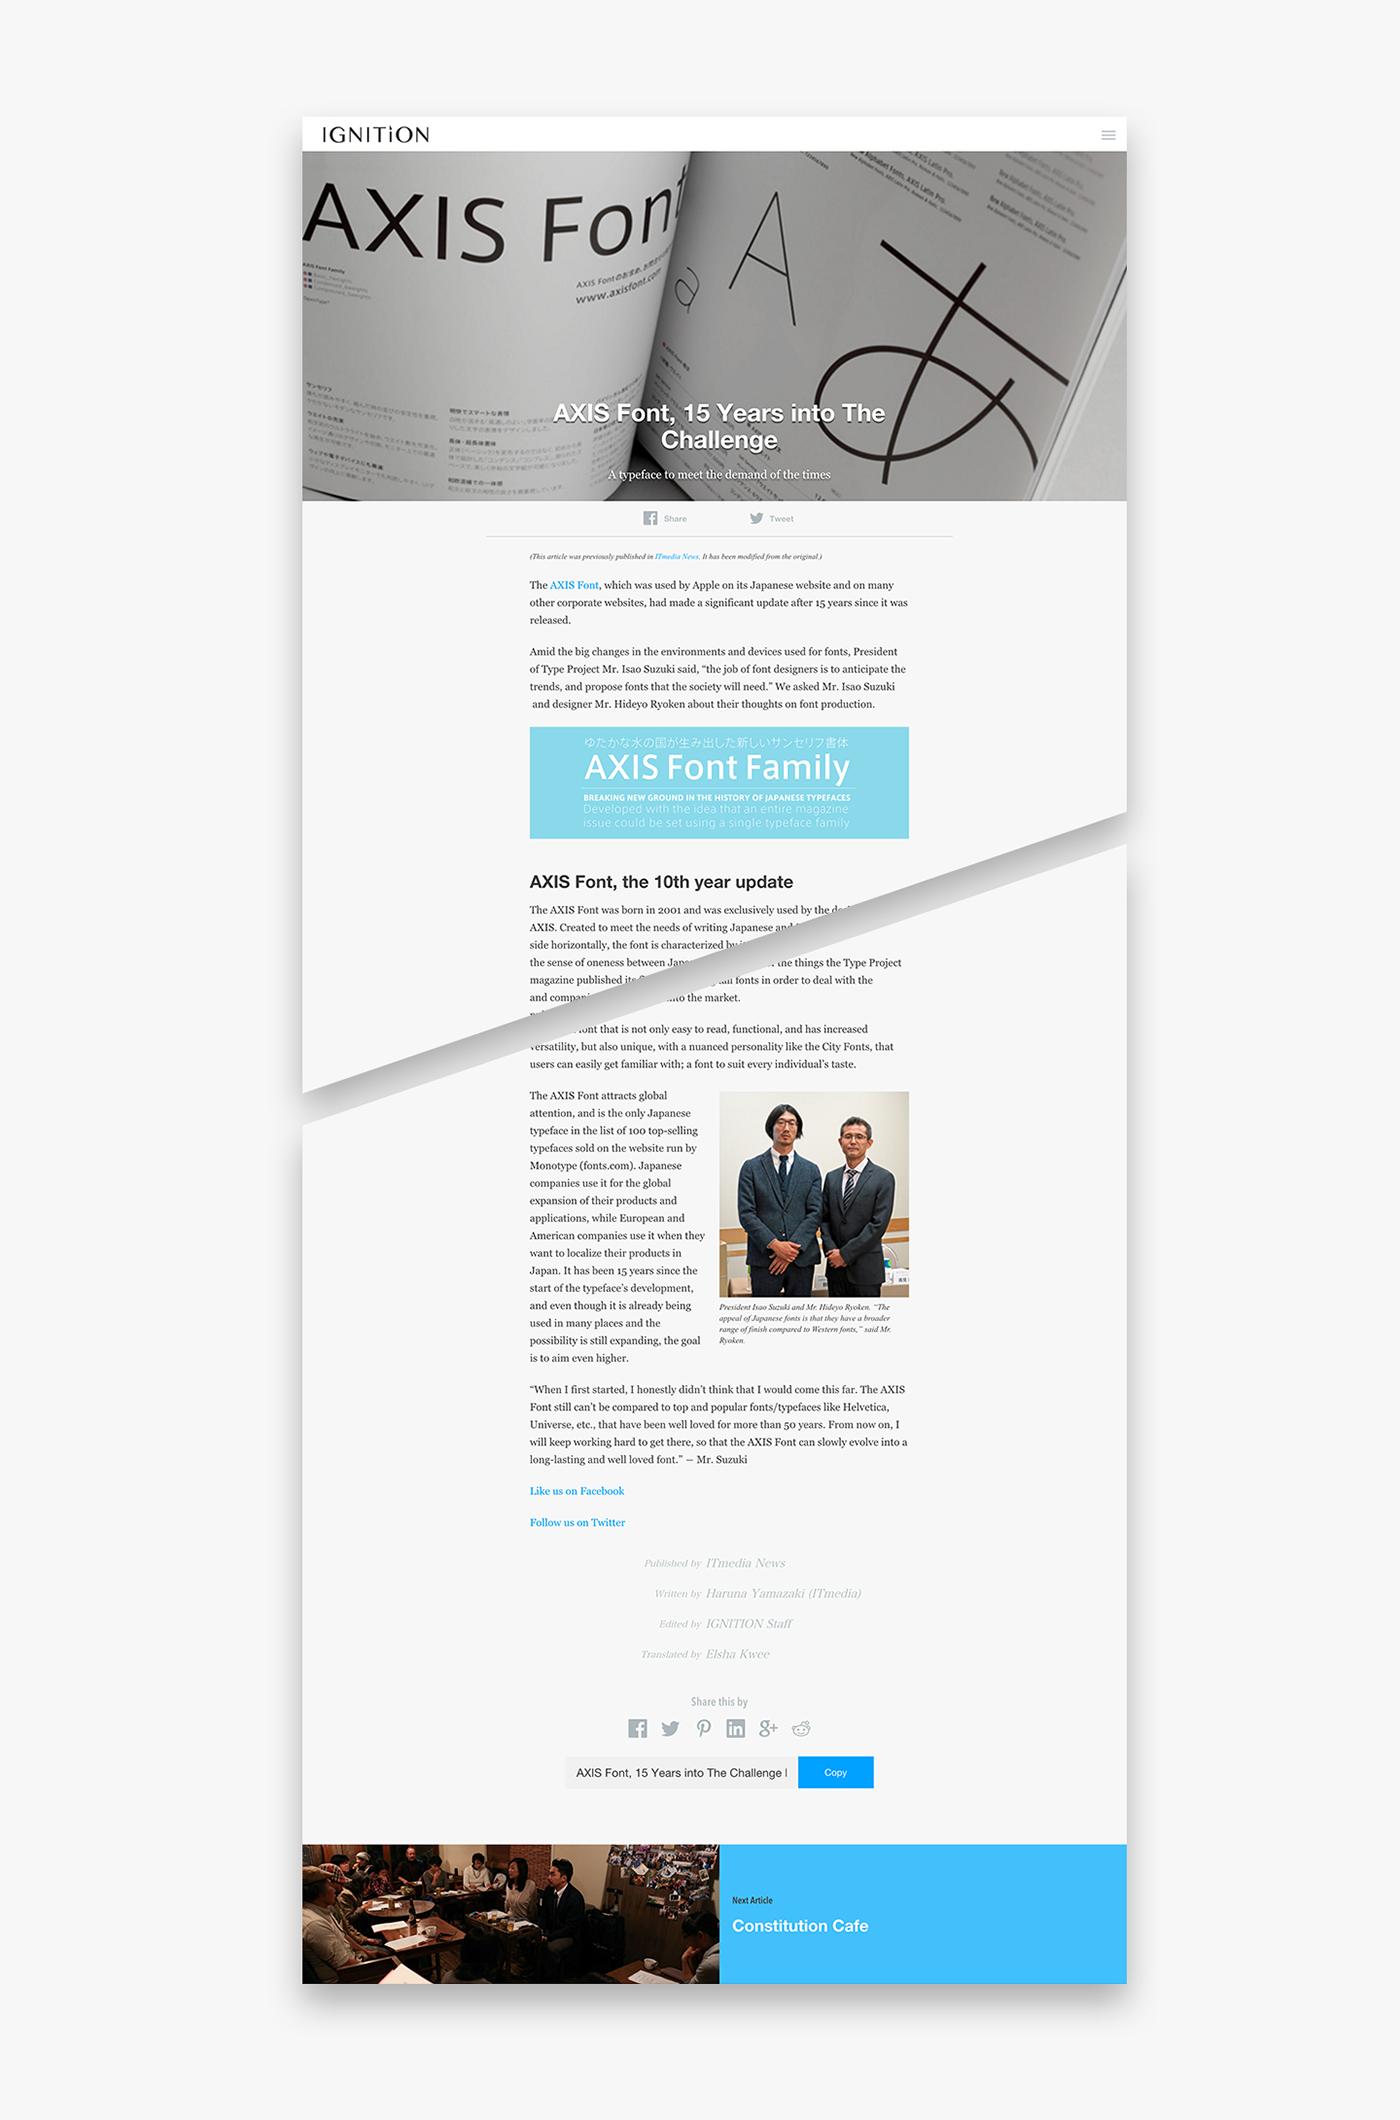 magazine culture media Web Media digital publication Web typography